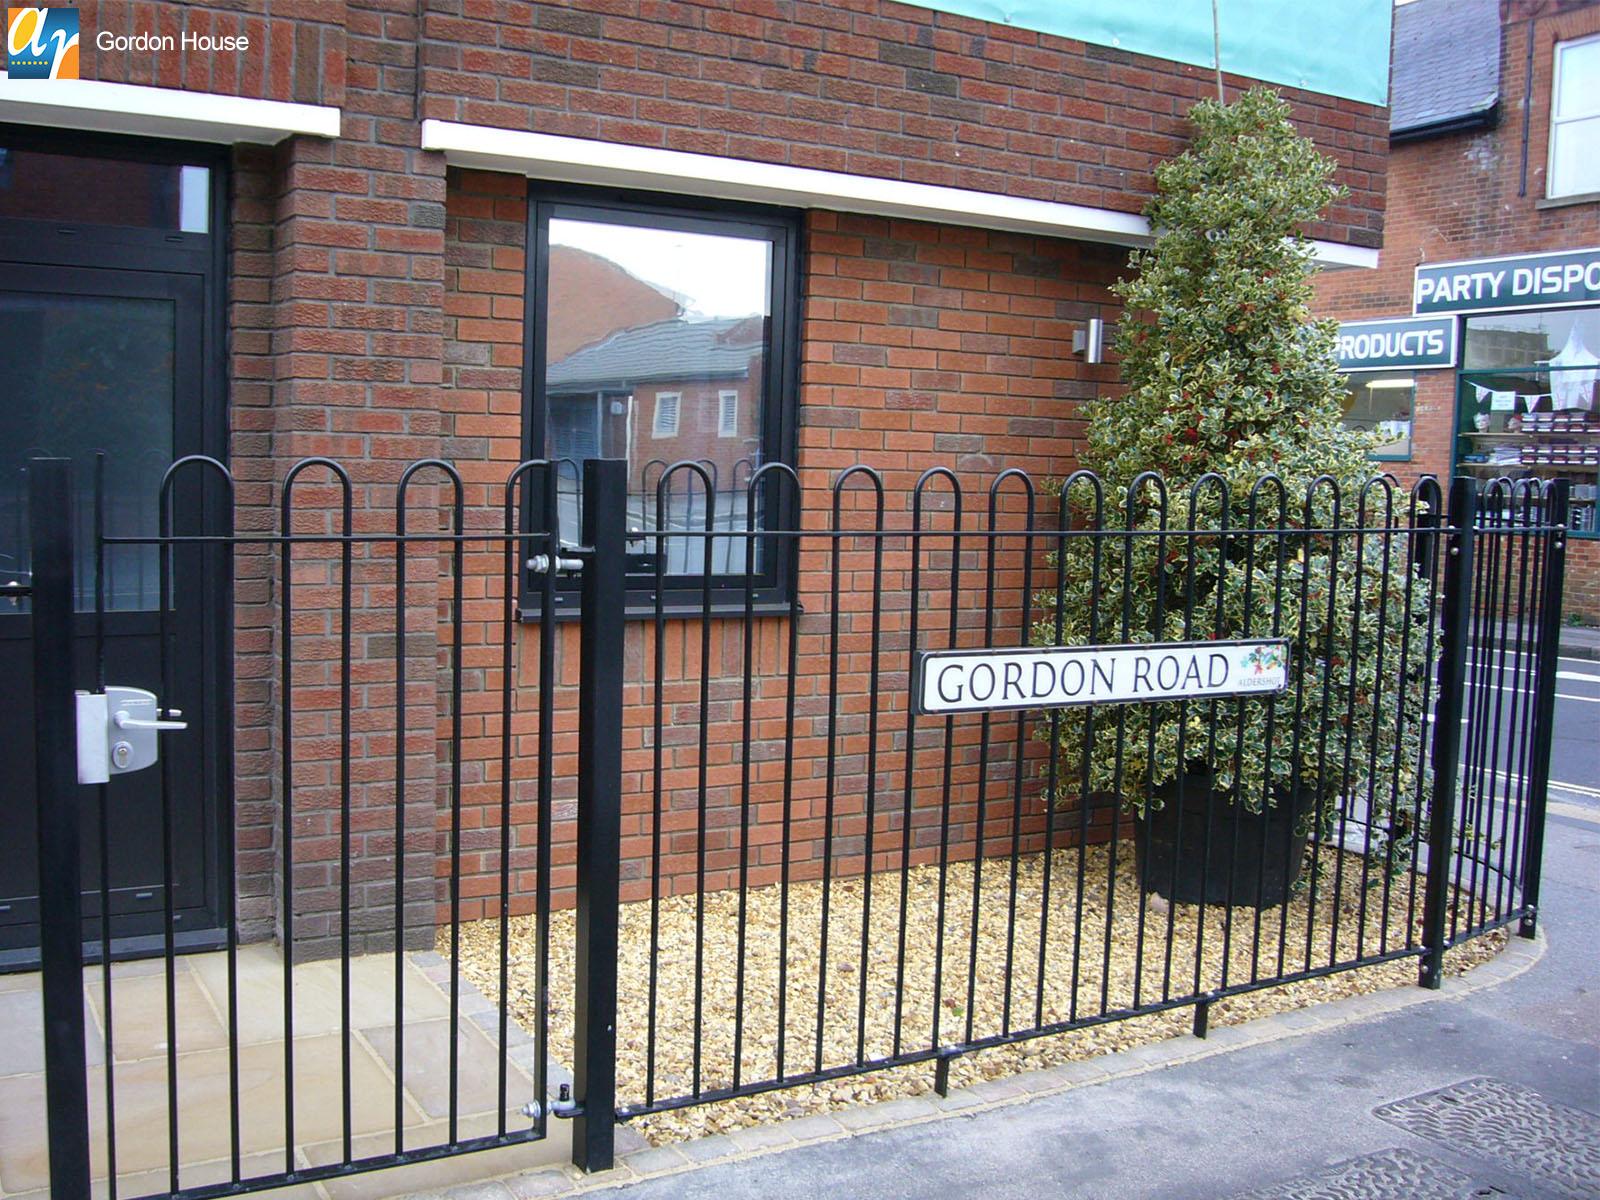 Gordon House standard bow top railings